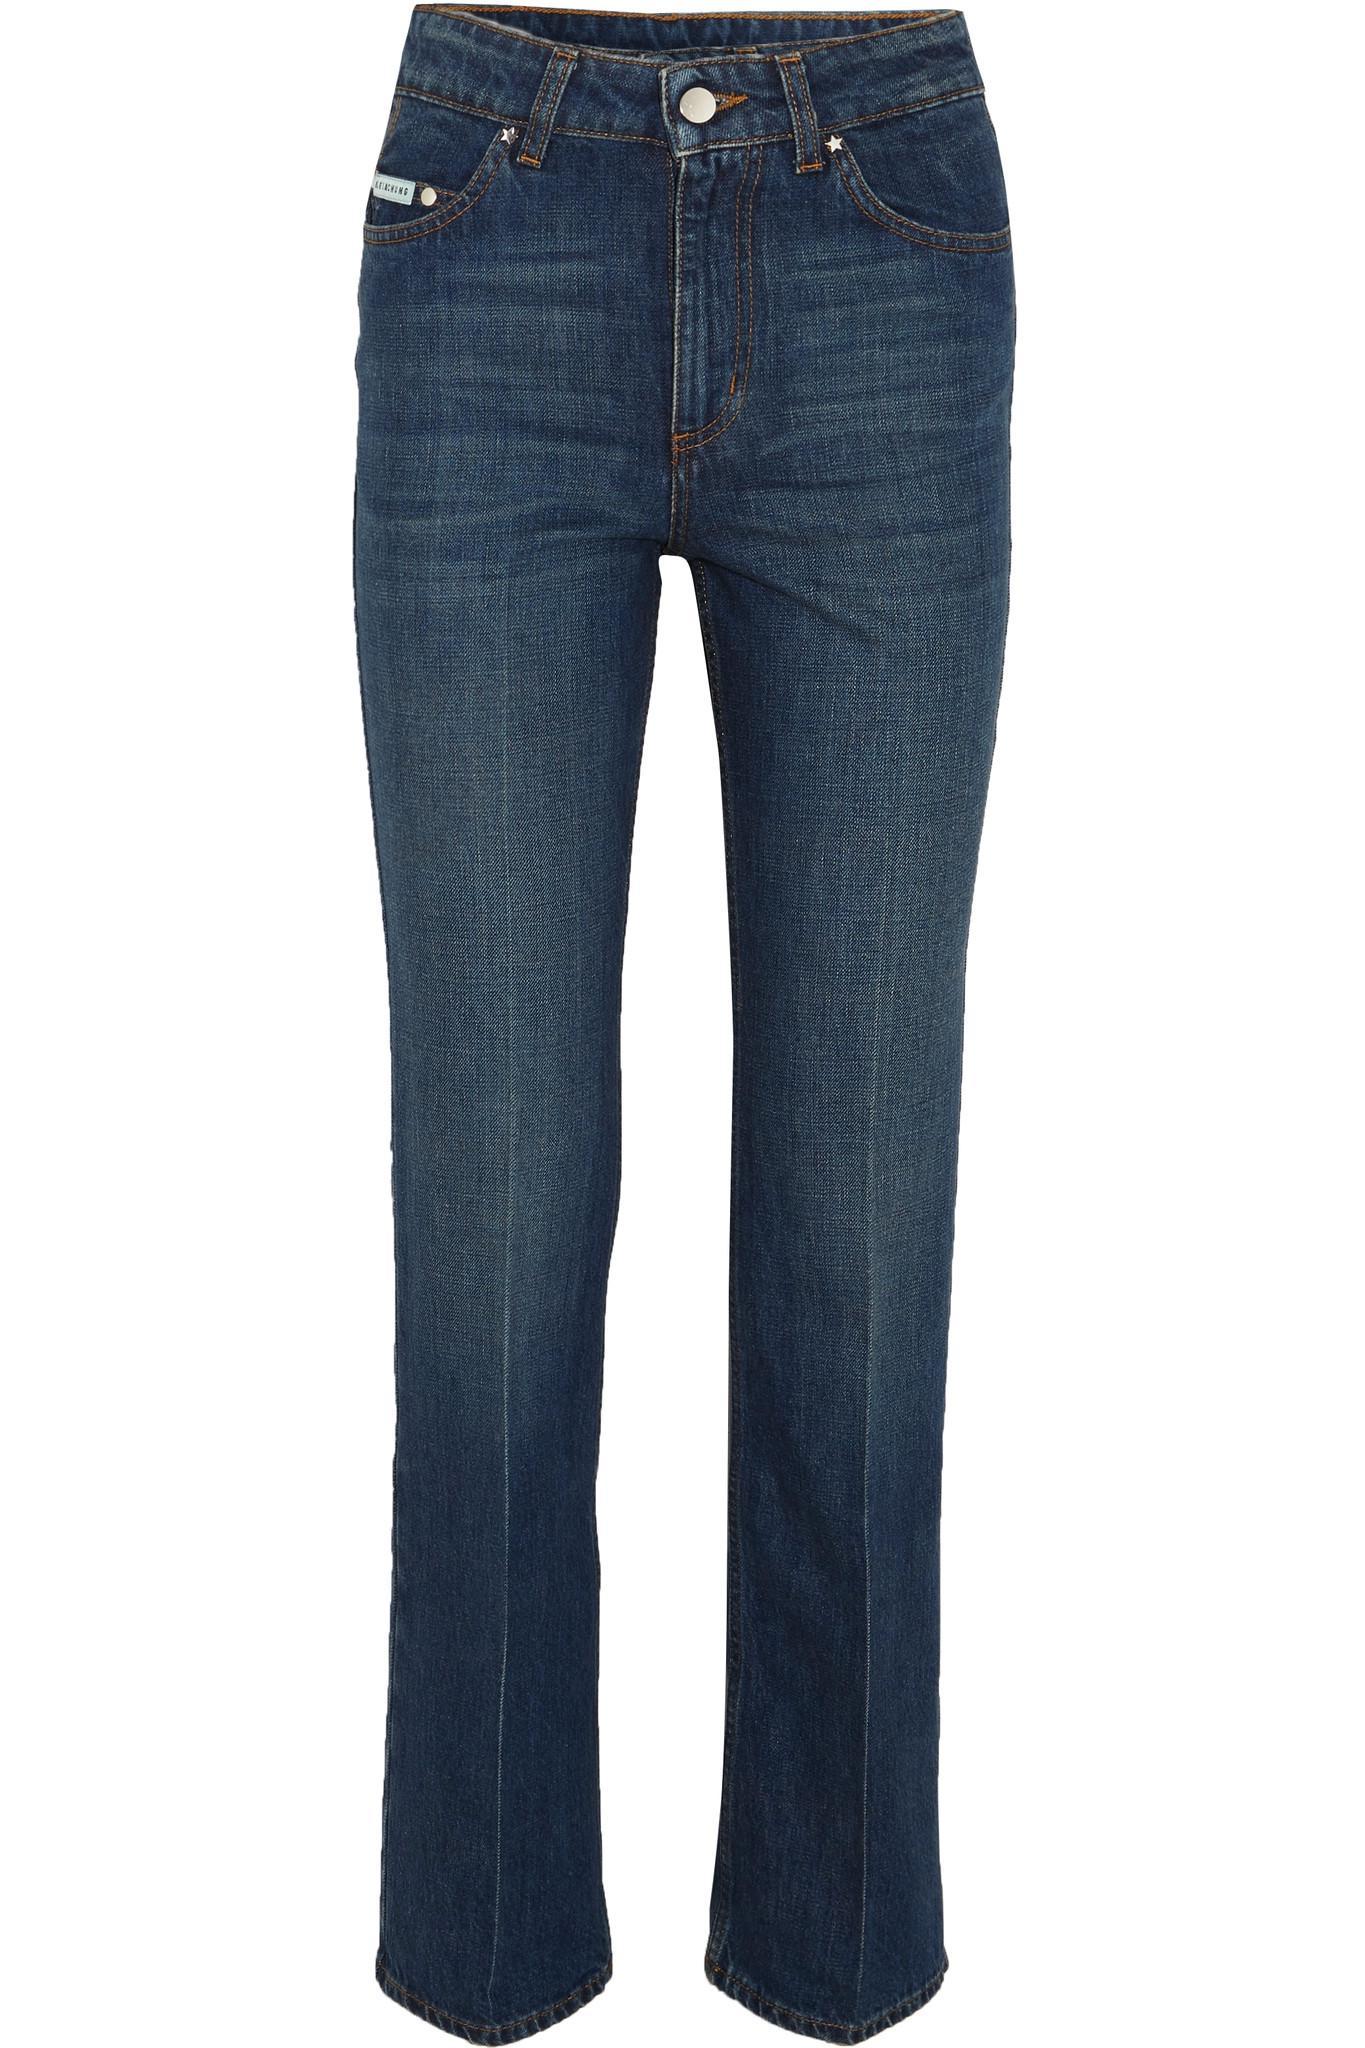 Alexa Chung Woman Frayed High-rise Straight-leg Jeans Mid Denim Size 24 AlexaChung ddTjXfMeL